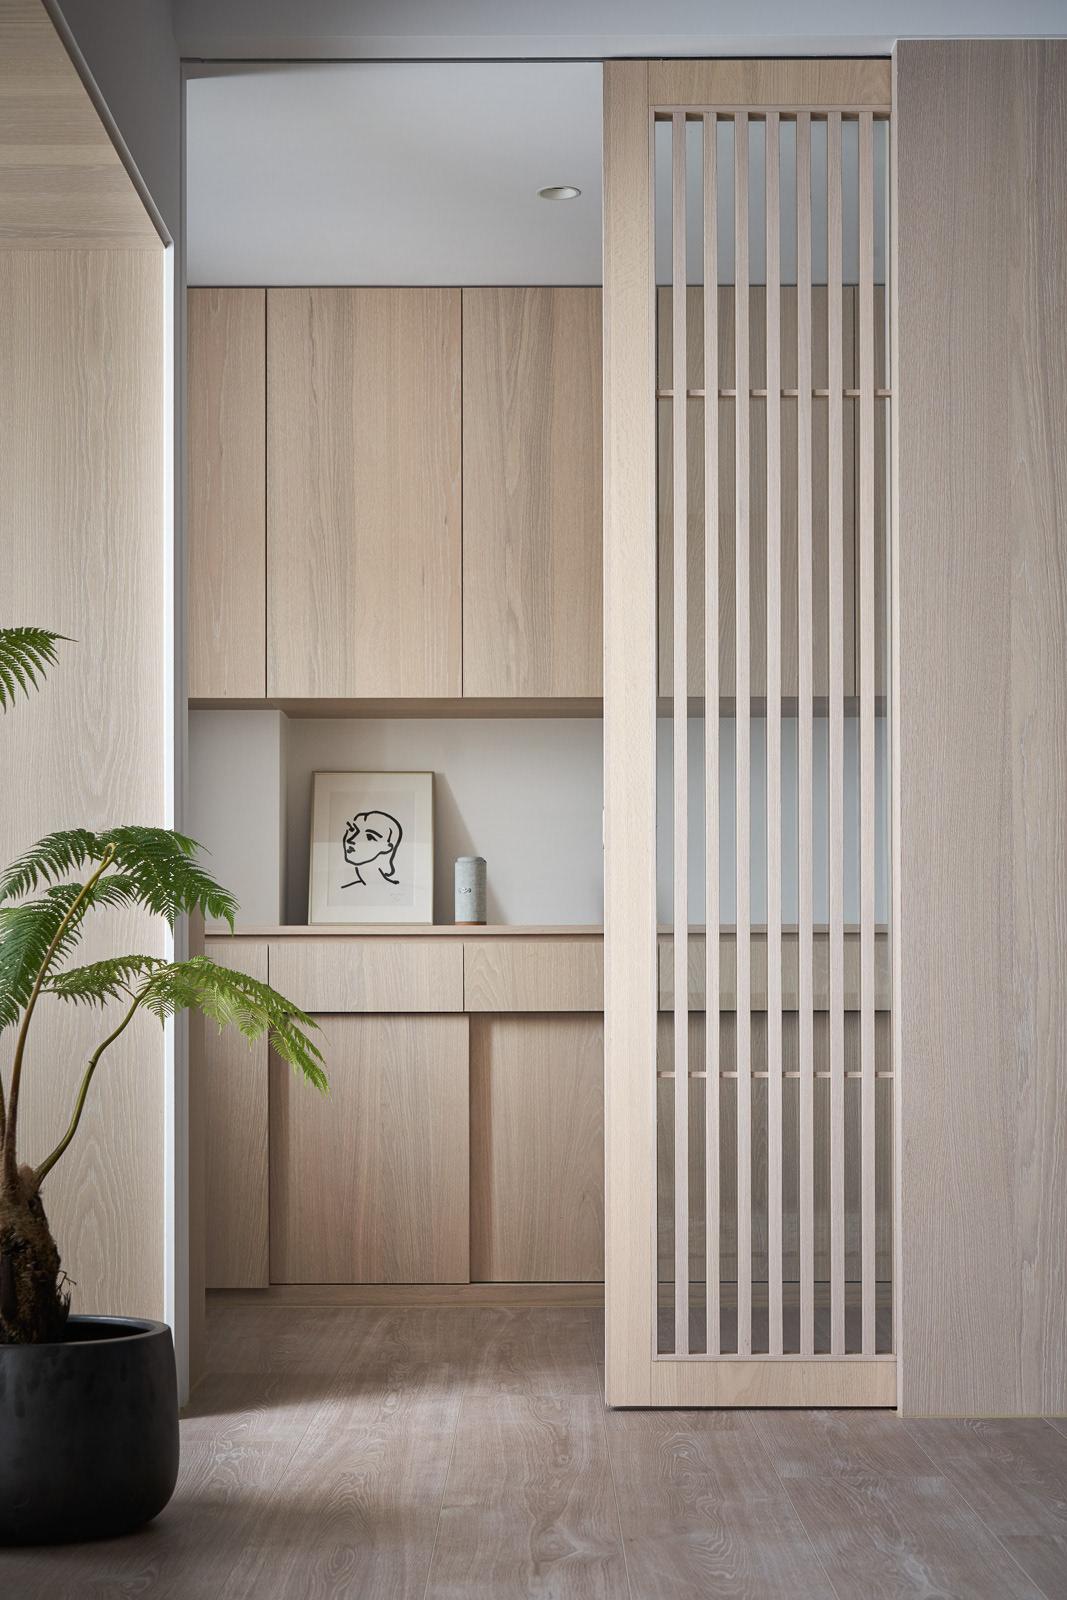 Image may contain: houseplant, door and floor